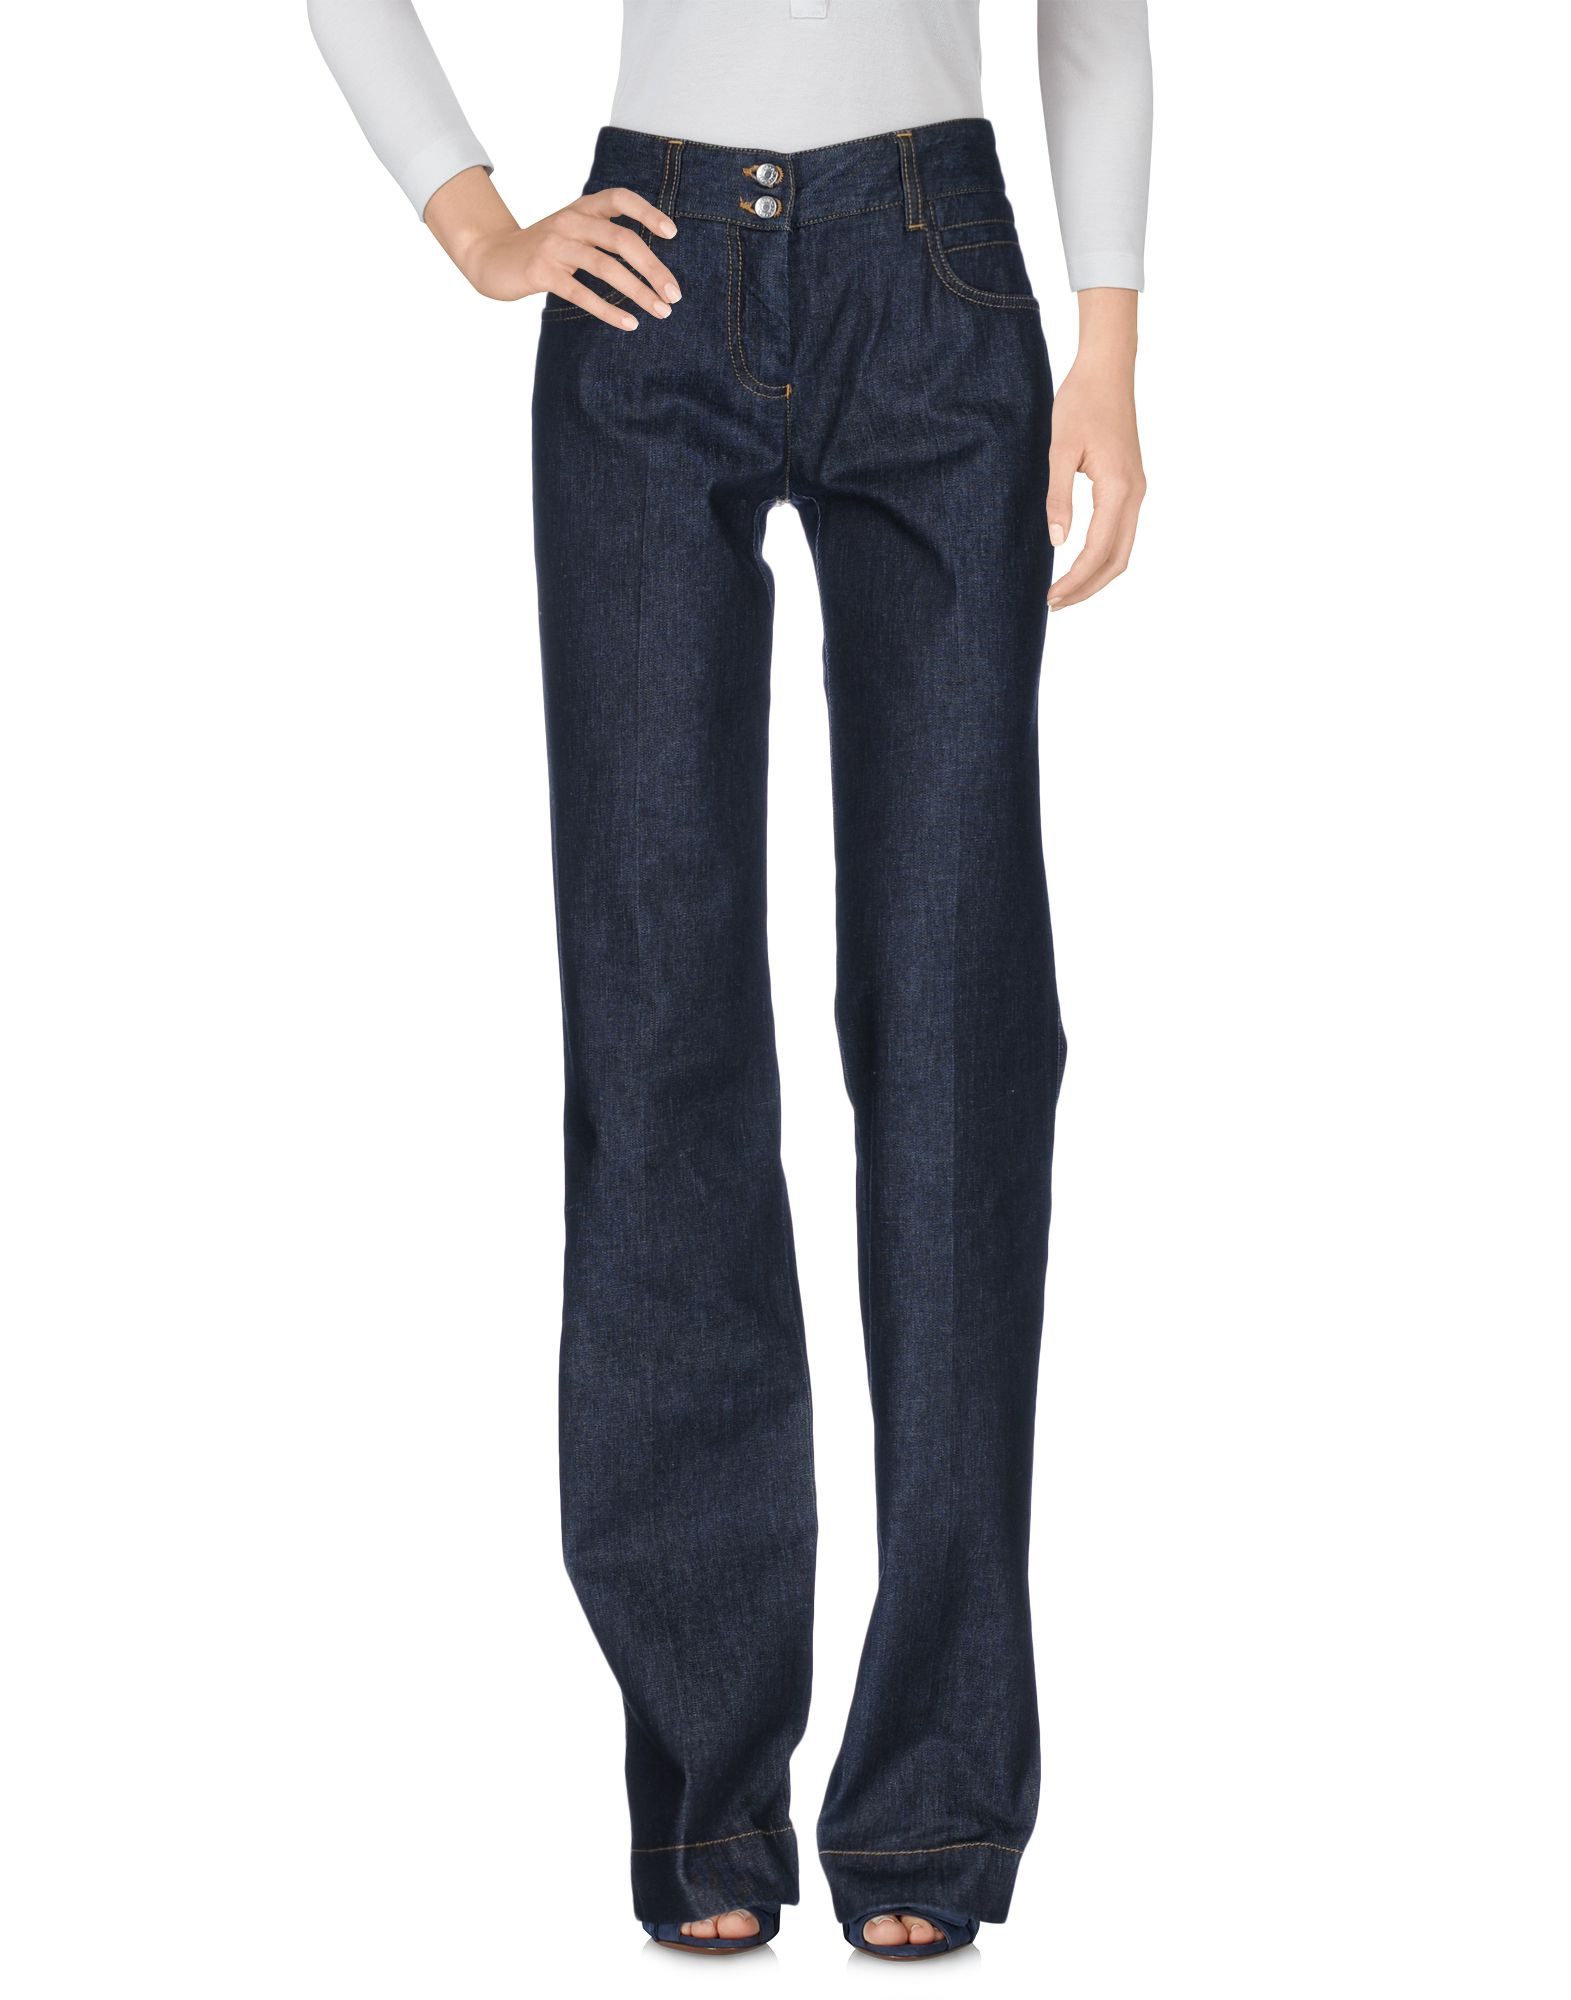 DOLCE & GABBANA Damen Jeanshose Farbe Blau Größe 1